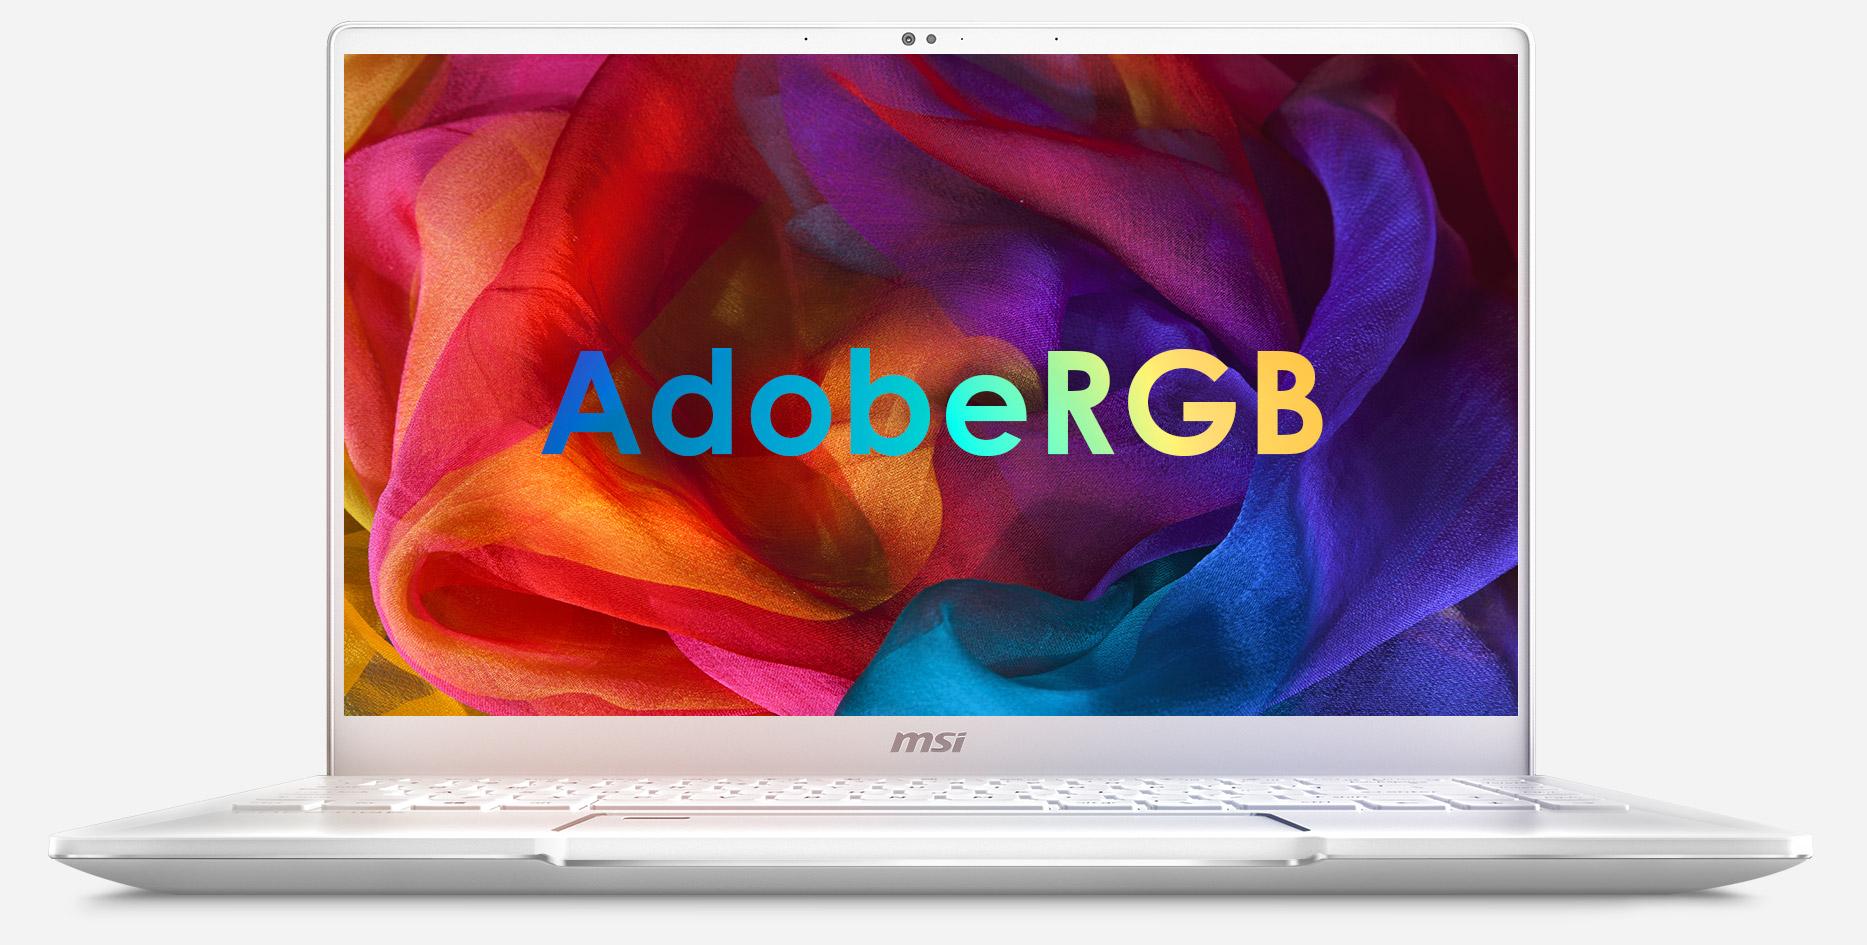 100% AdobeRGB